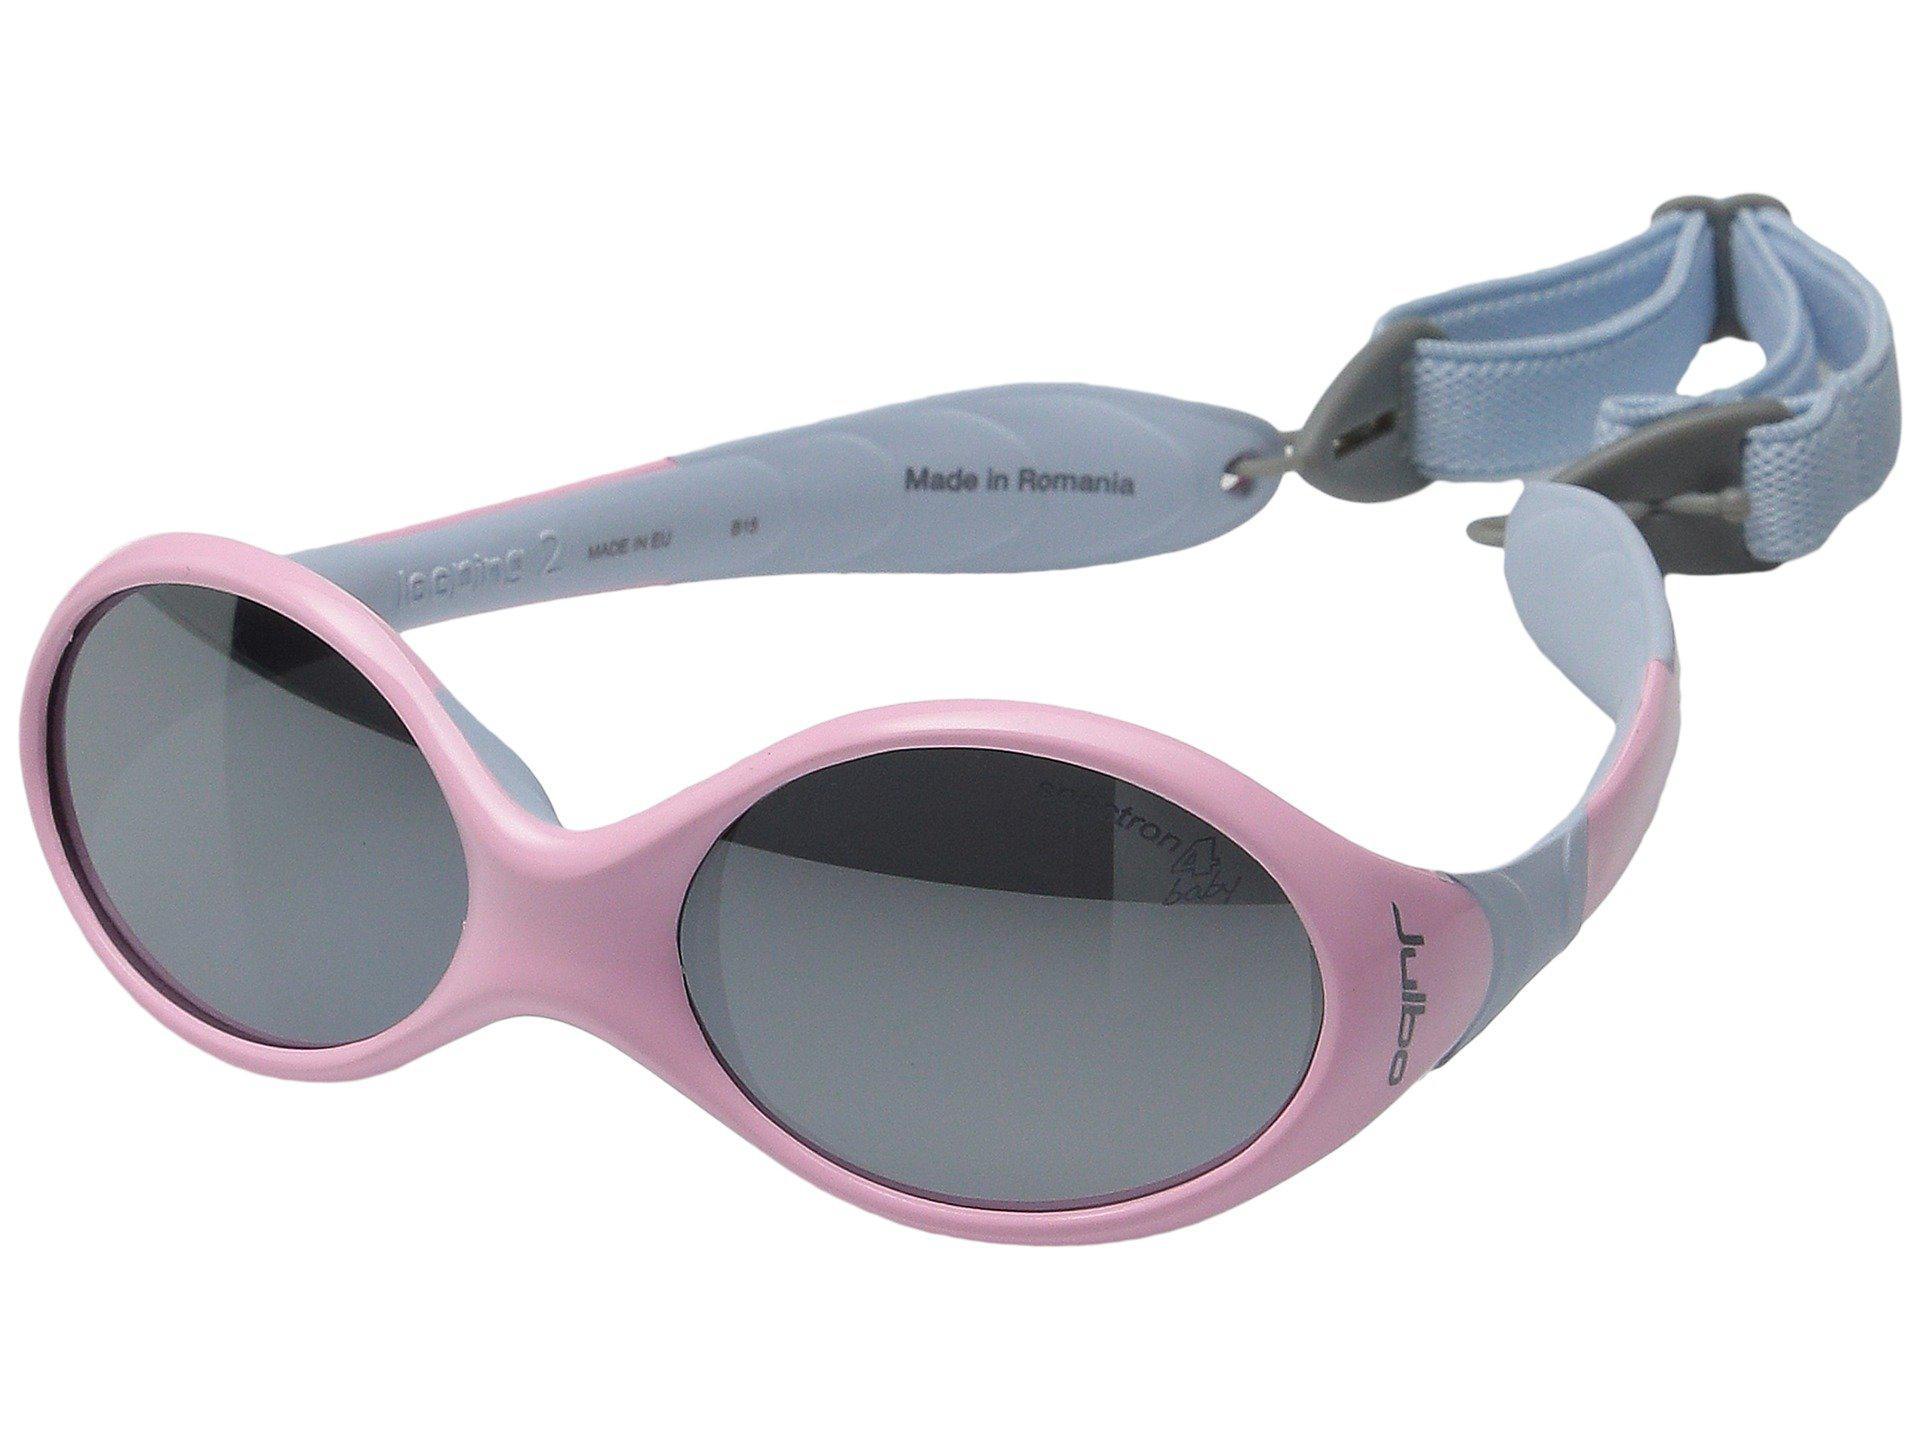 6de9a36aac Lyst - Julbo Eyewear Kids Looping 2 Sunglasses